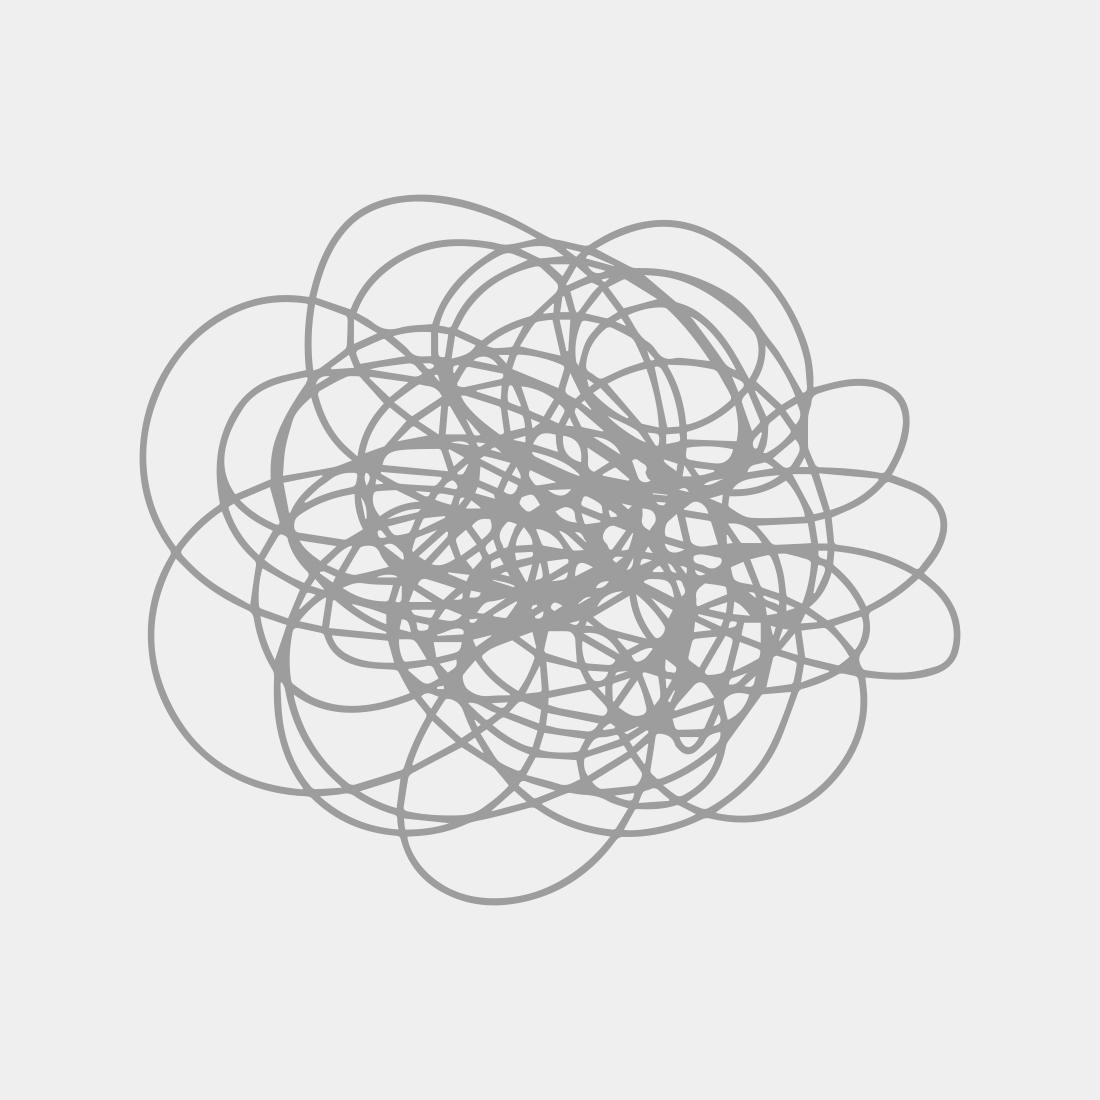 John Constable The Leaping Horse Book Royal Academy of Arts Publicaton